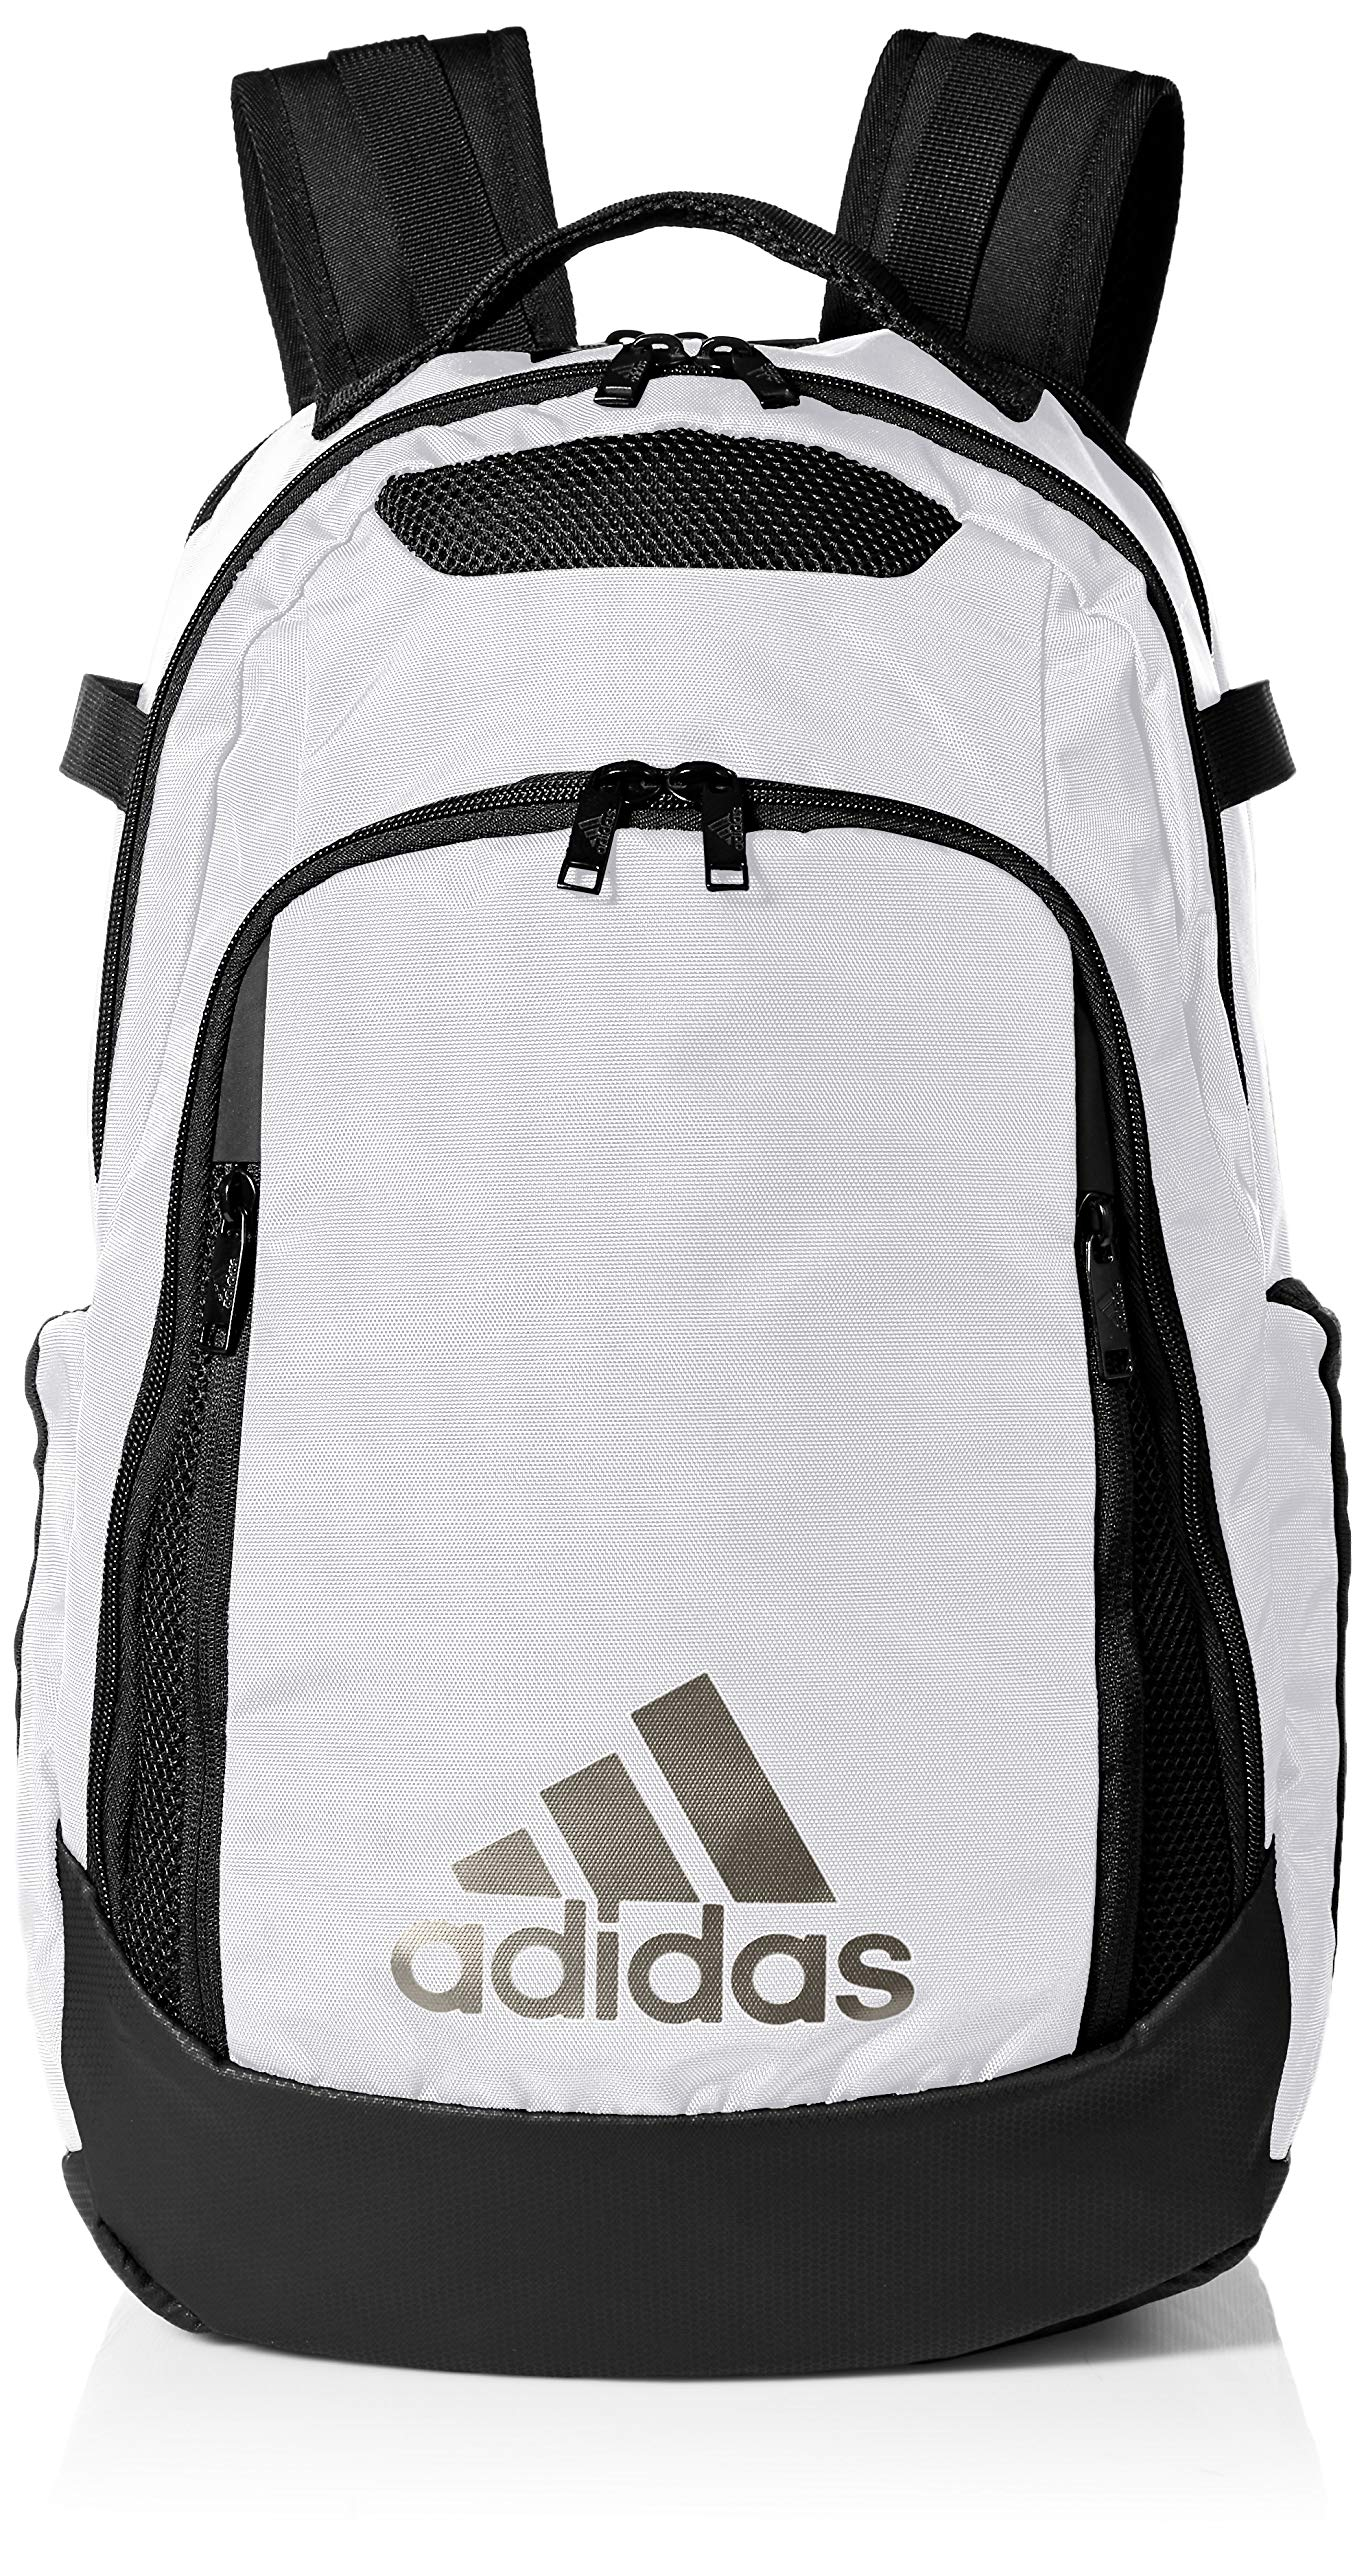 adidas 5 Star Backpack White Black